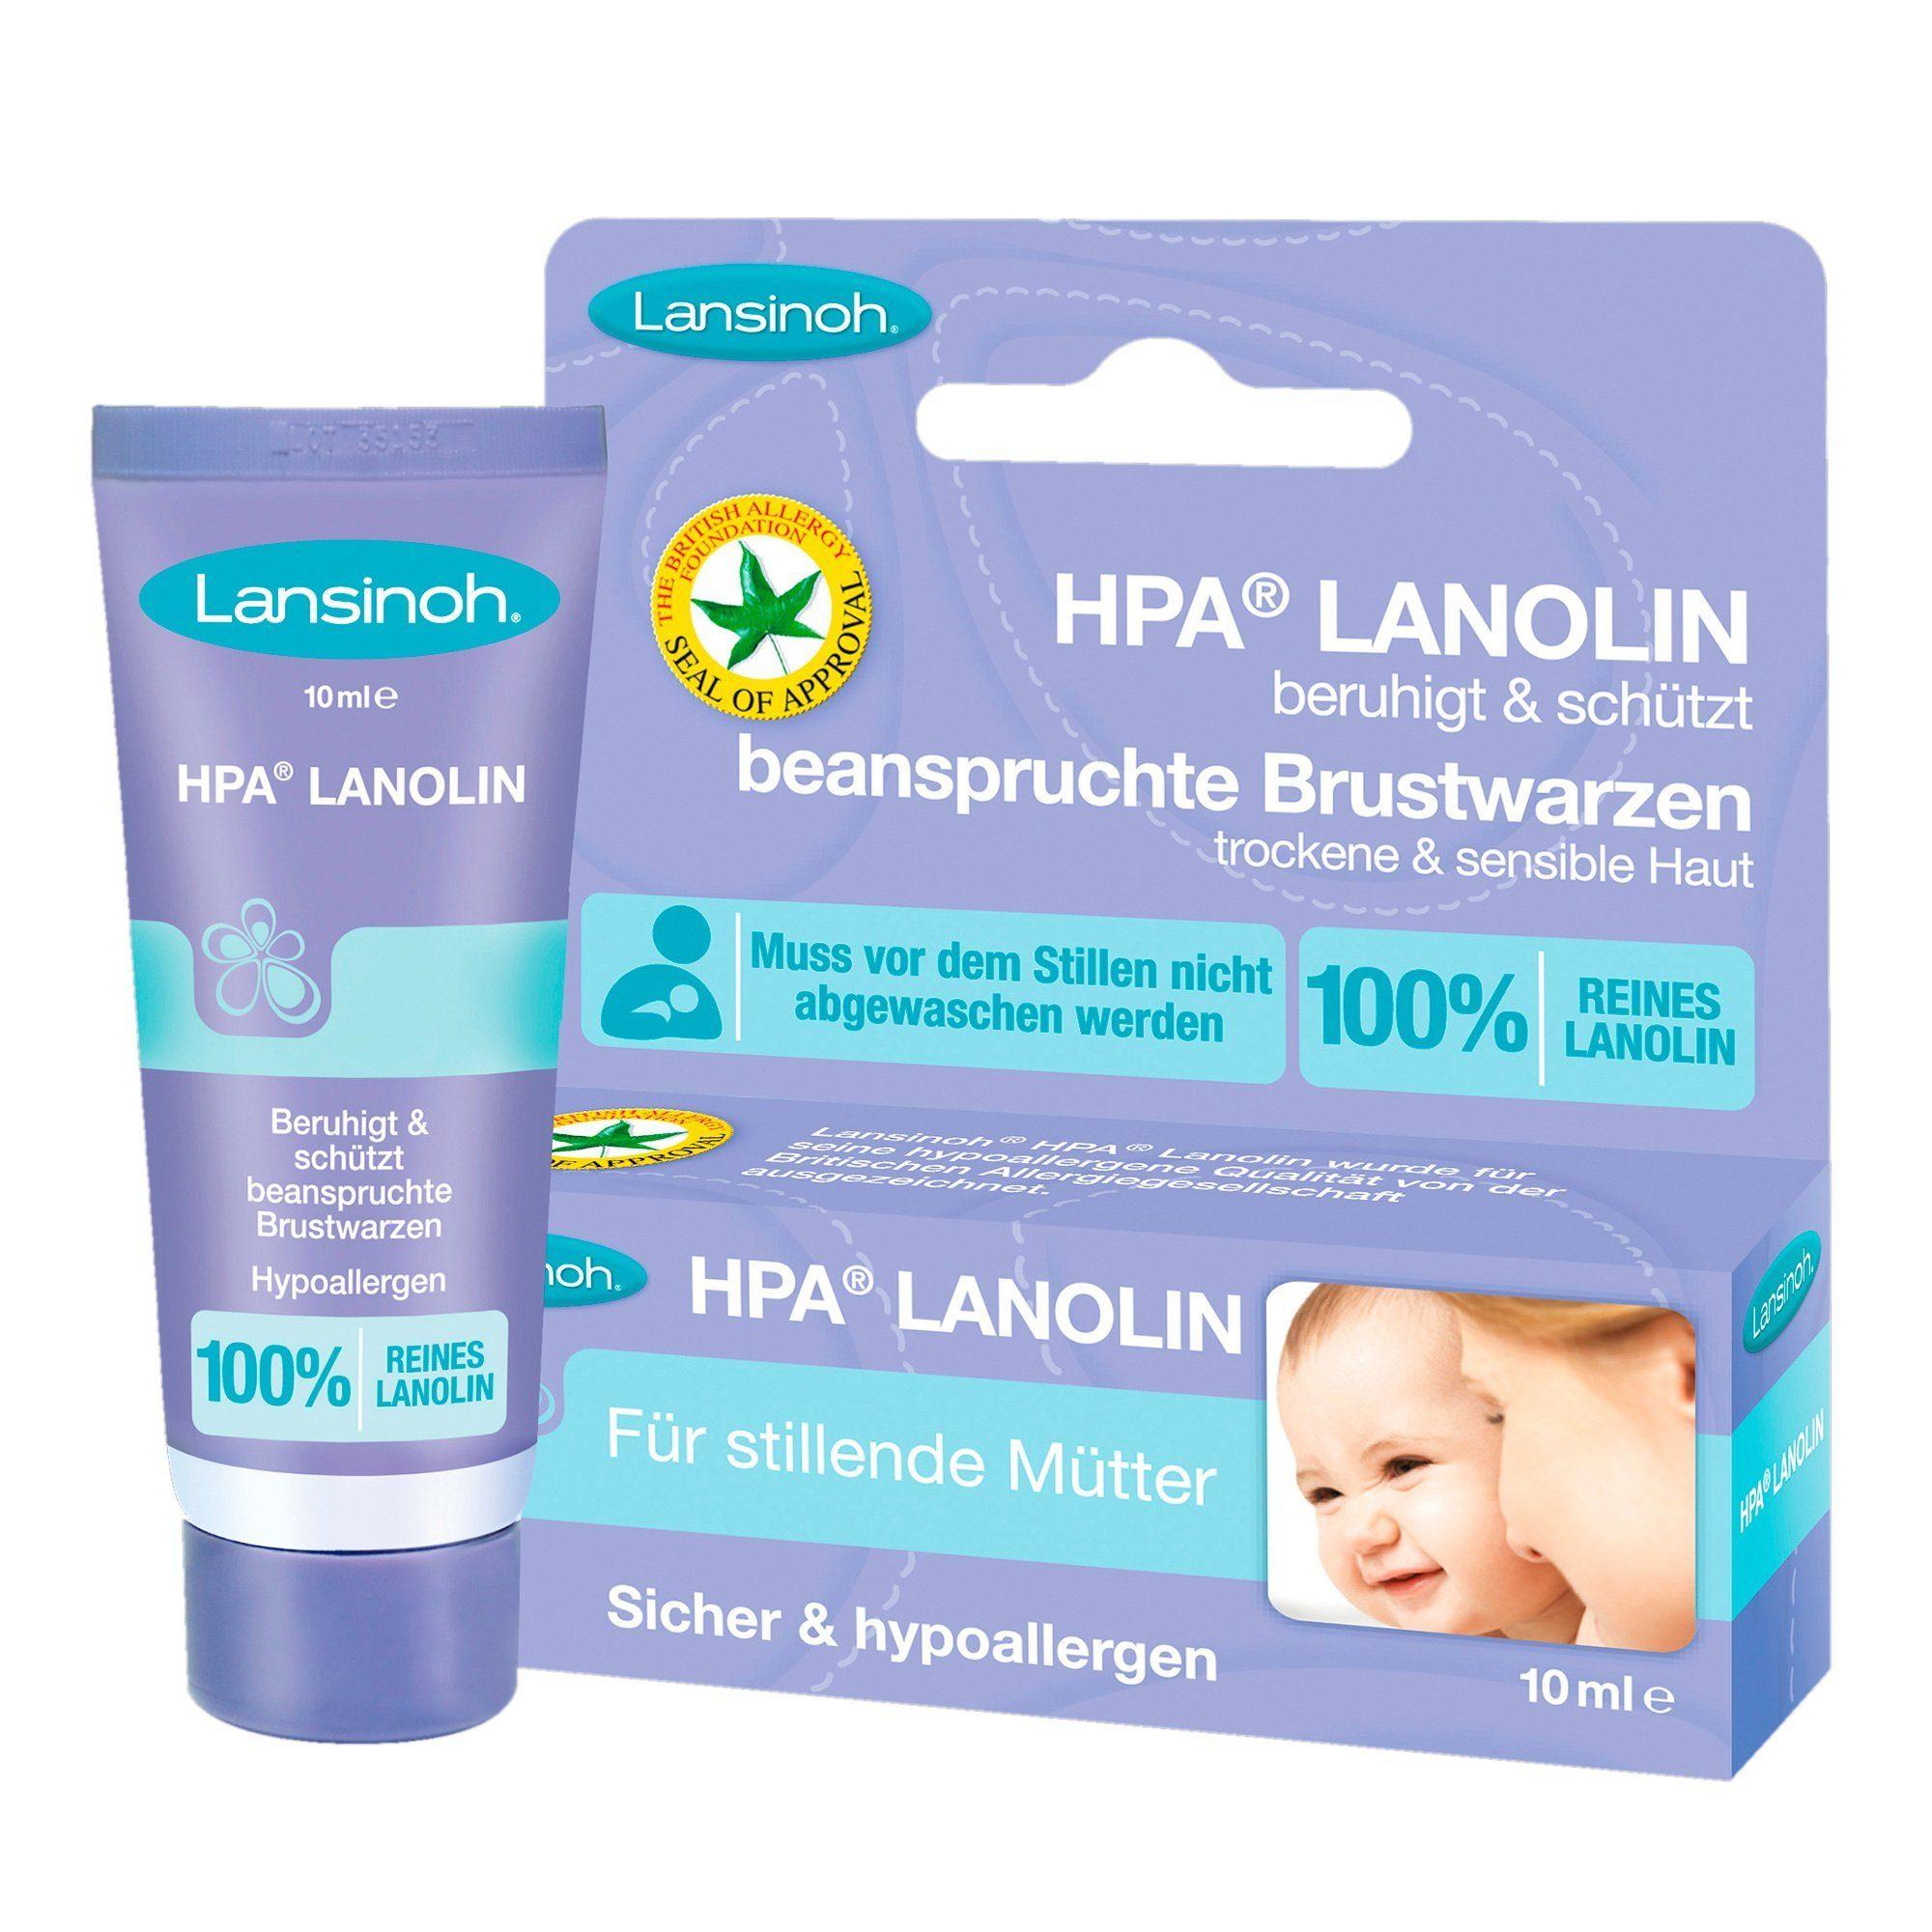 LANSINOH HPA® Lanolin 10 ml Brustwarzenpflege